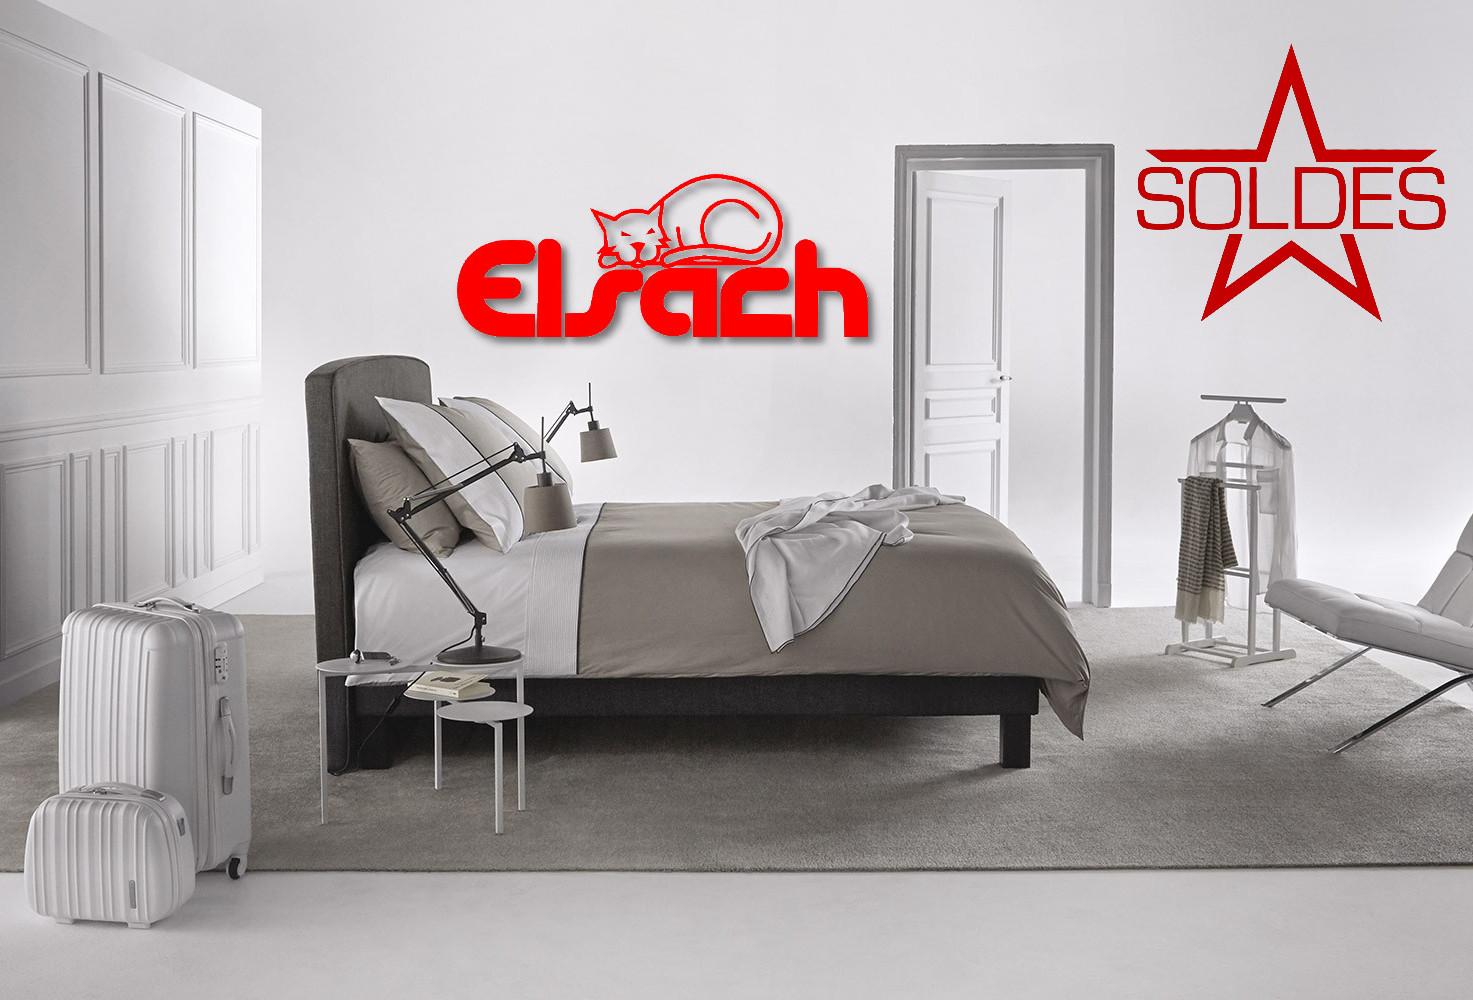 Elsach Belgique Soldes